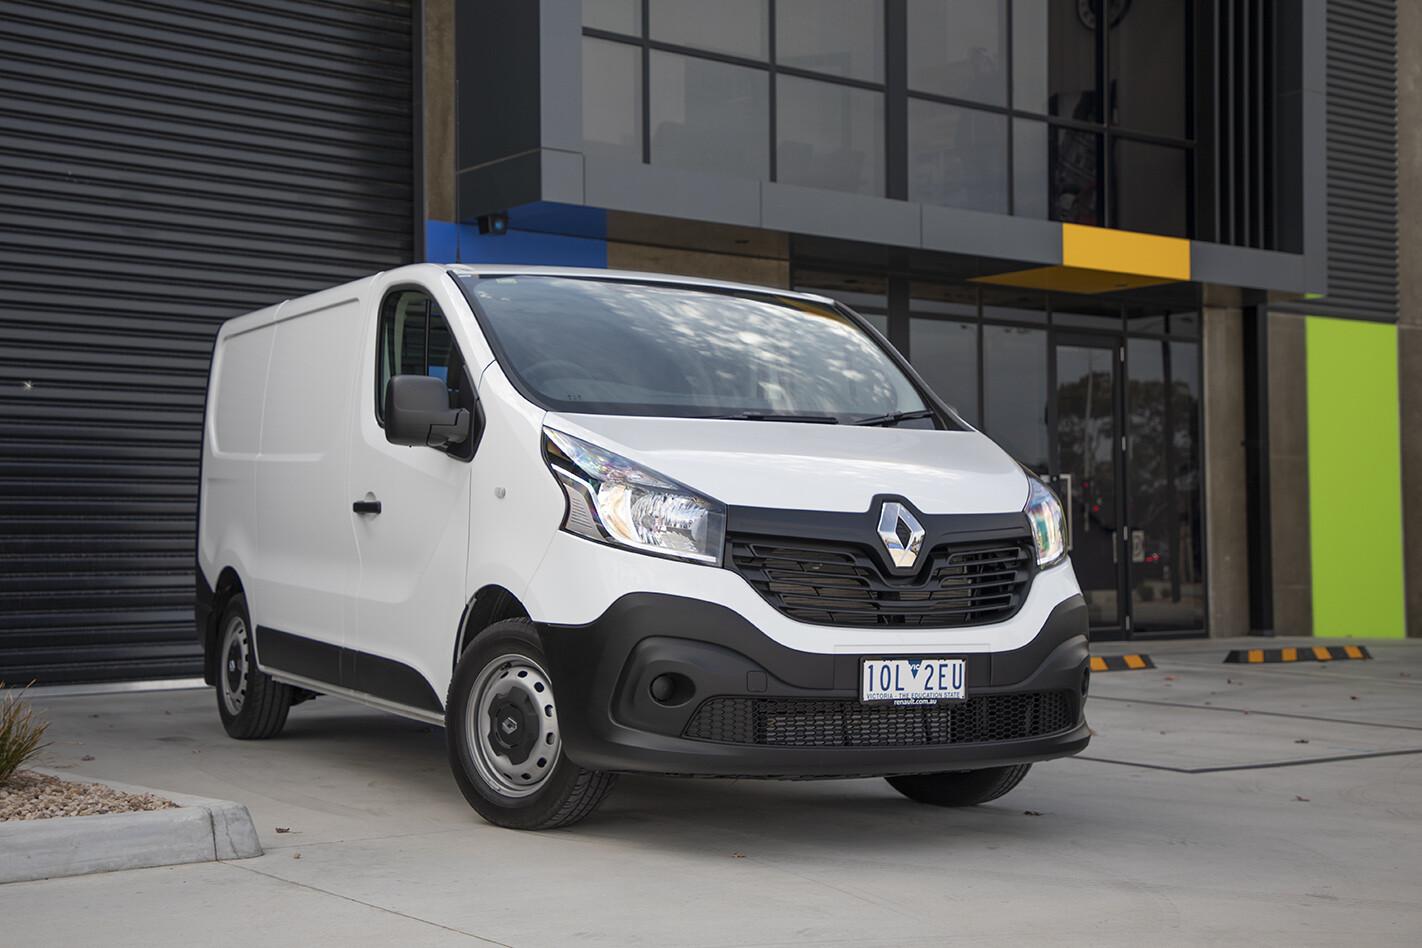 2019 Renault Trafic Traderlife Review Front Side Static Jpg